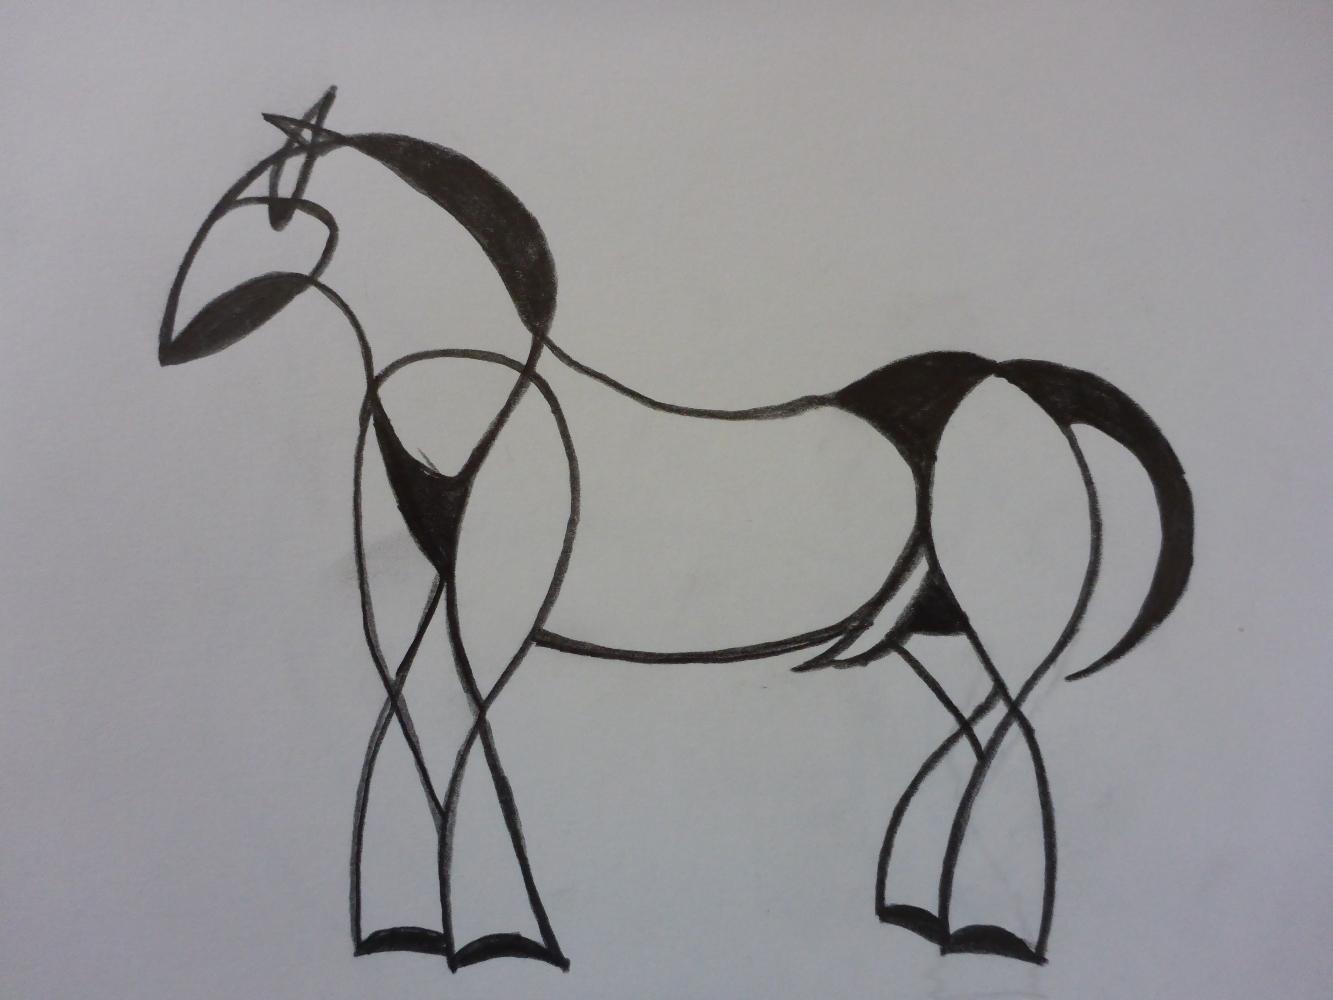 """Stallion VIII"", 2018, pencil on paper, 30 x 21 cm"